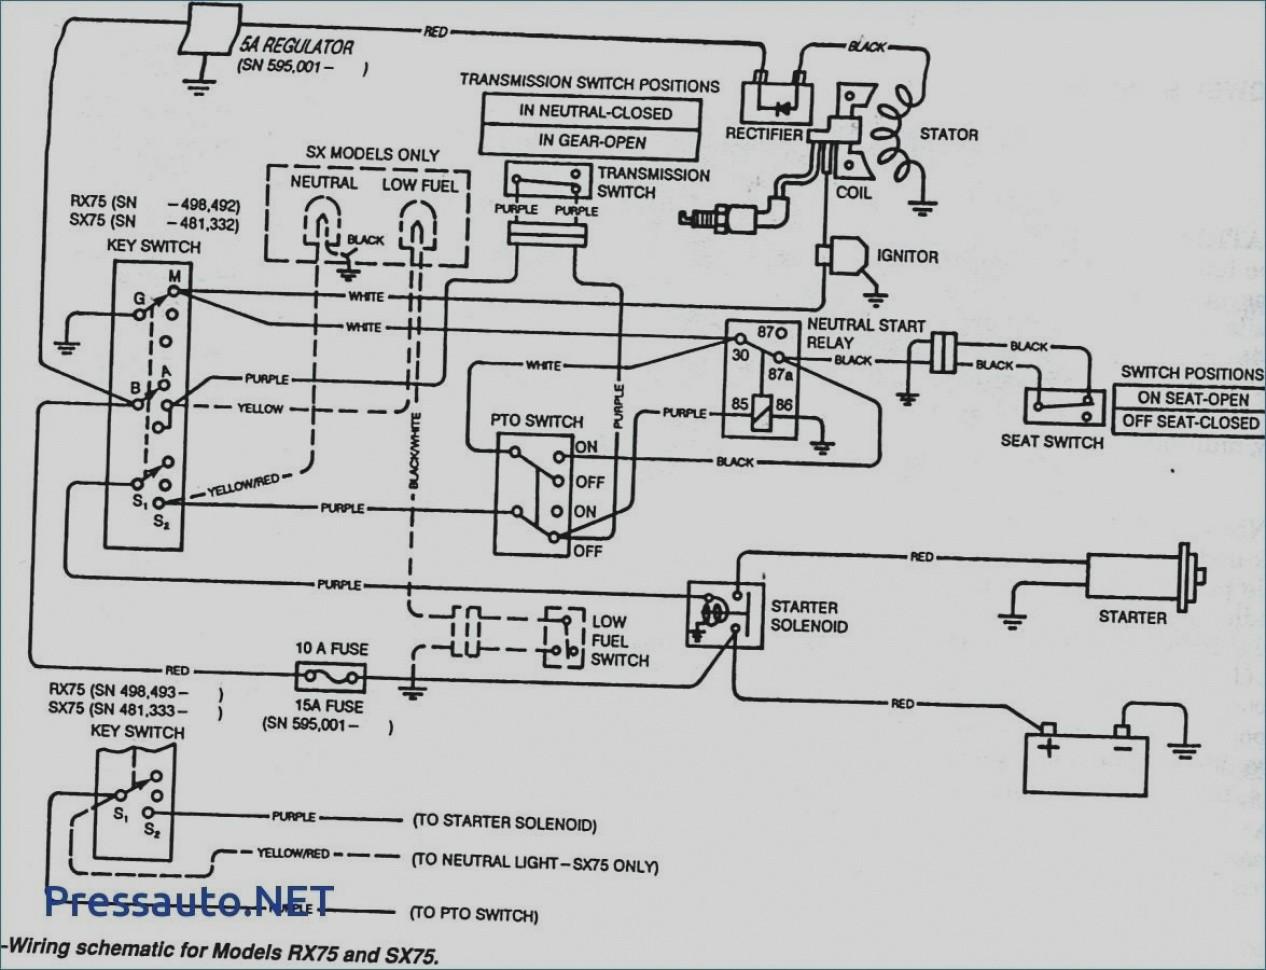 Pto Switch Wiring Diagram